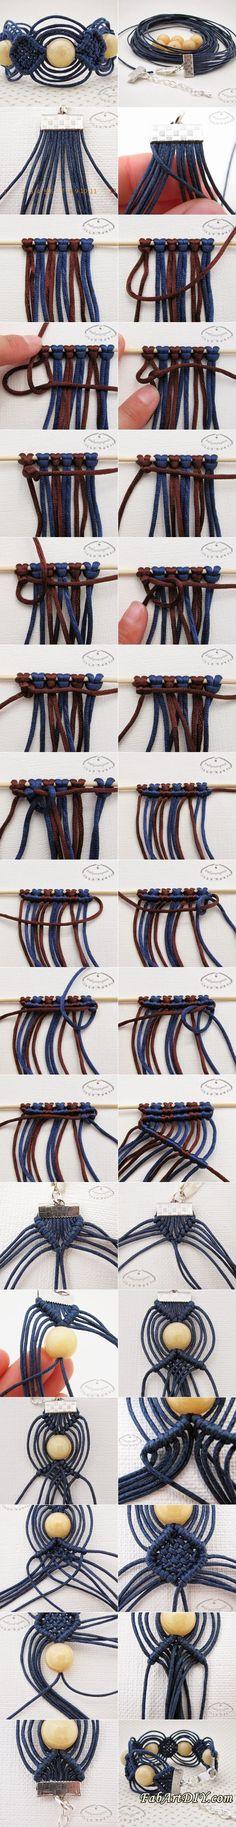 DIY Beaded Woven Bracelet | www.FabArtDIY.com LIKE Us on Facebook ==> https://www.facebook.com/FabArtDIY: